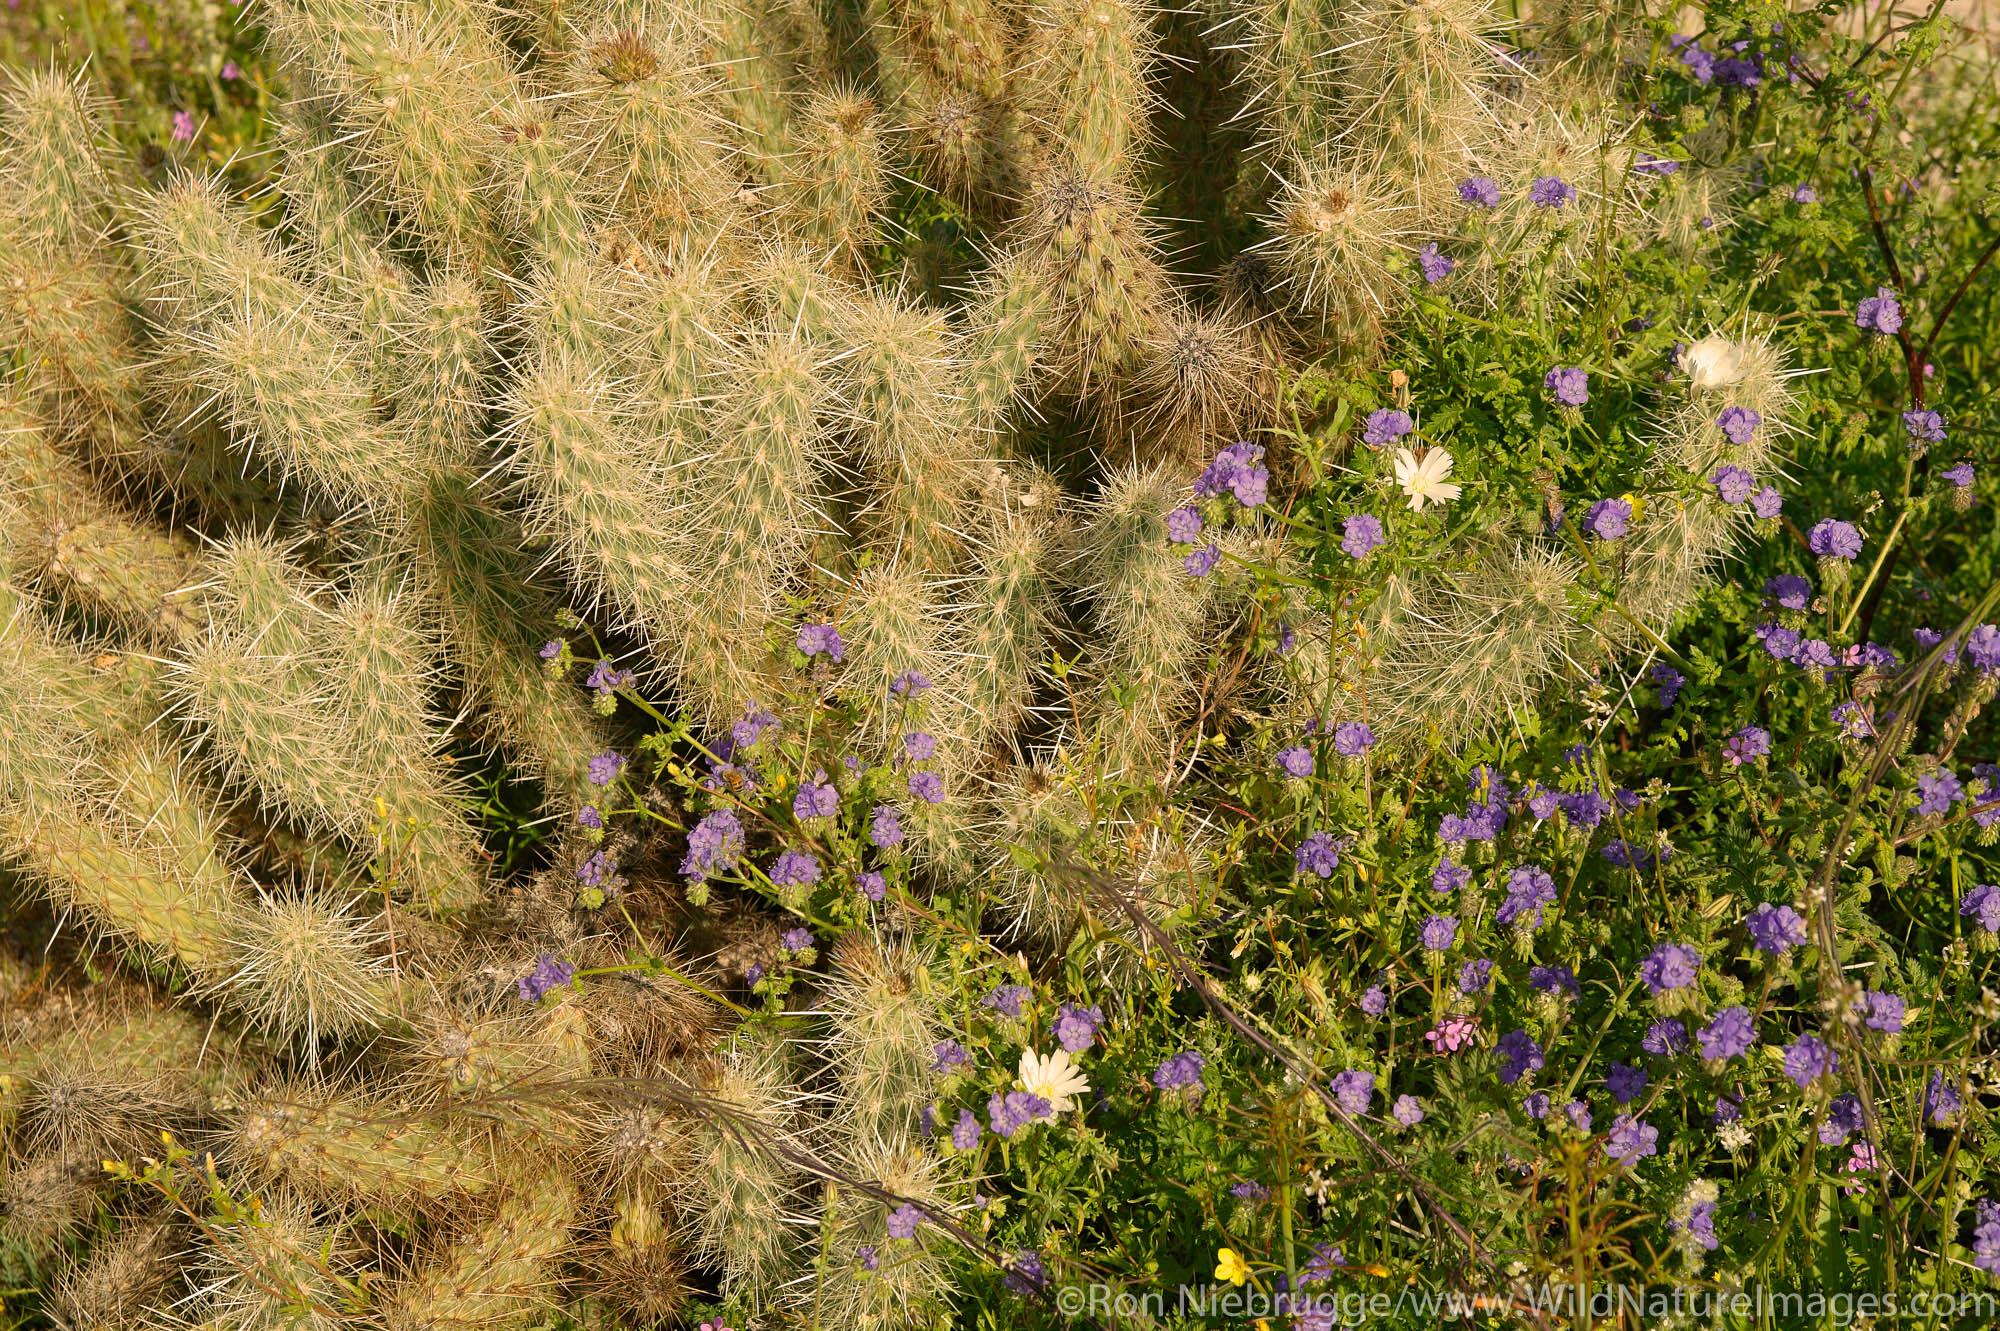 Wild Heliotrope also called Common phacelia,  Distans phacelia or even blue-eyed scorpion weed (Phacelia distans) Anza-Borrego...